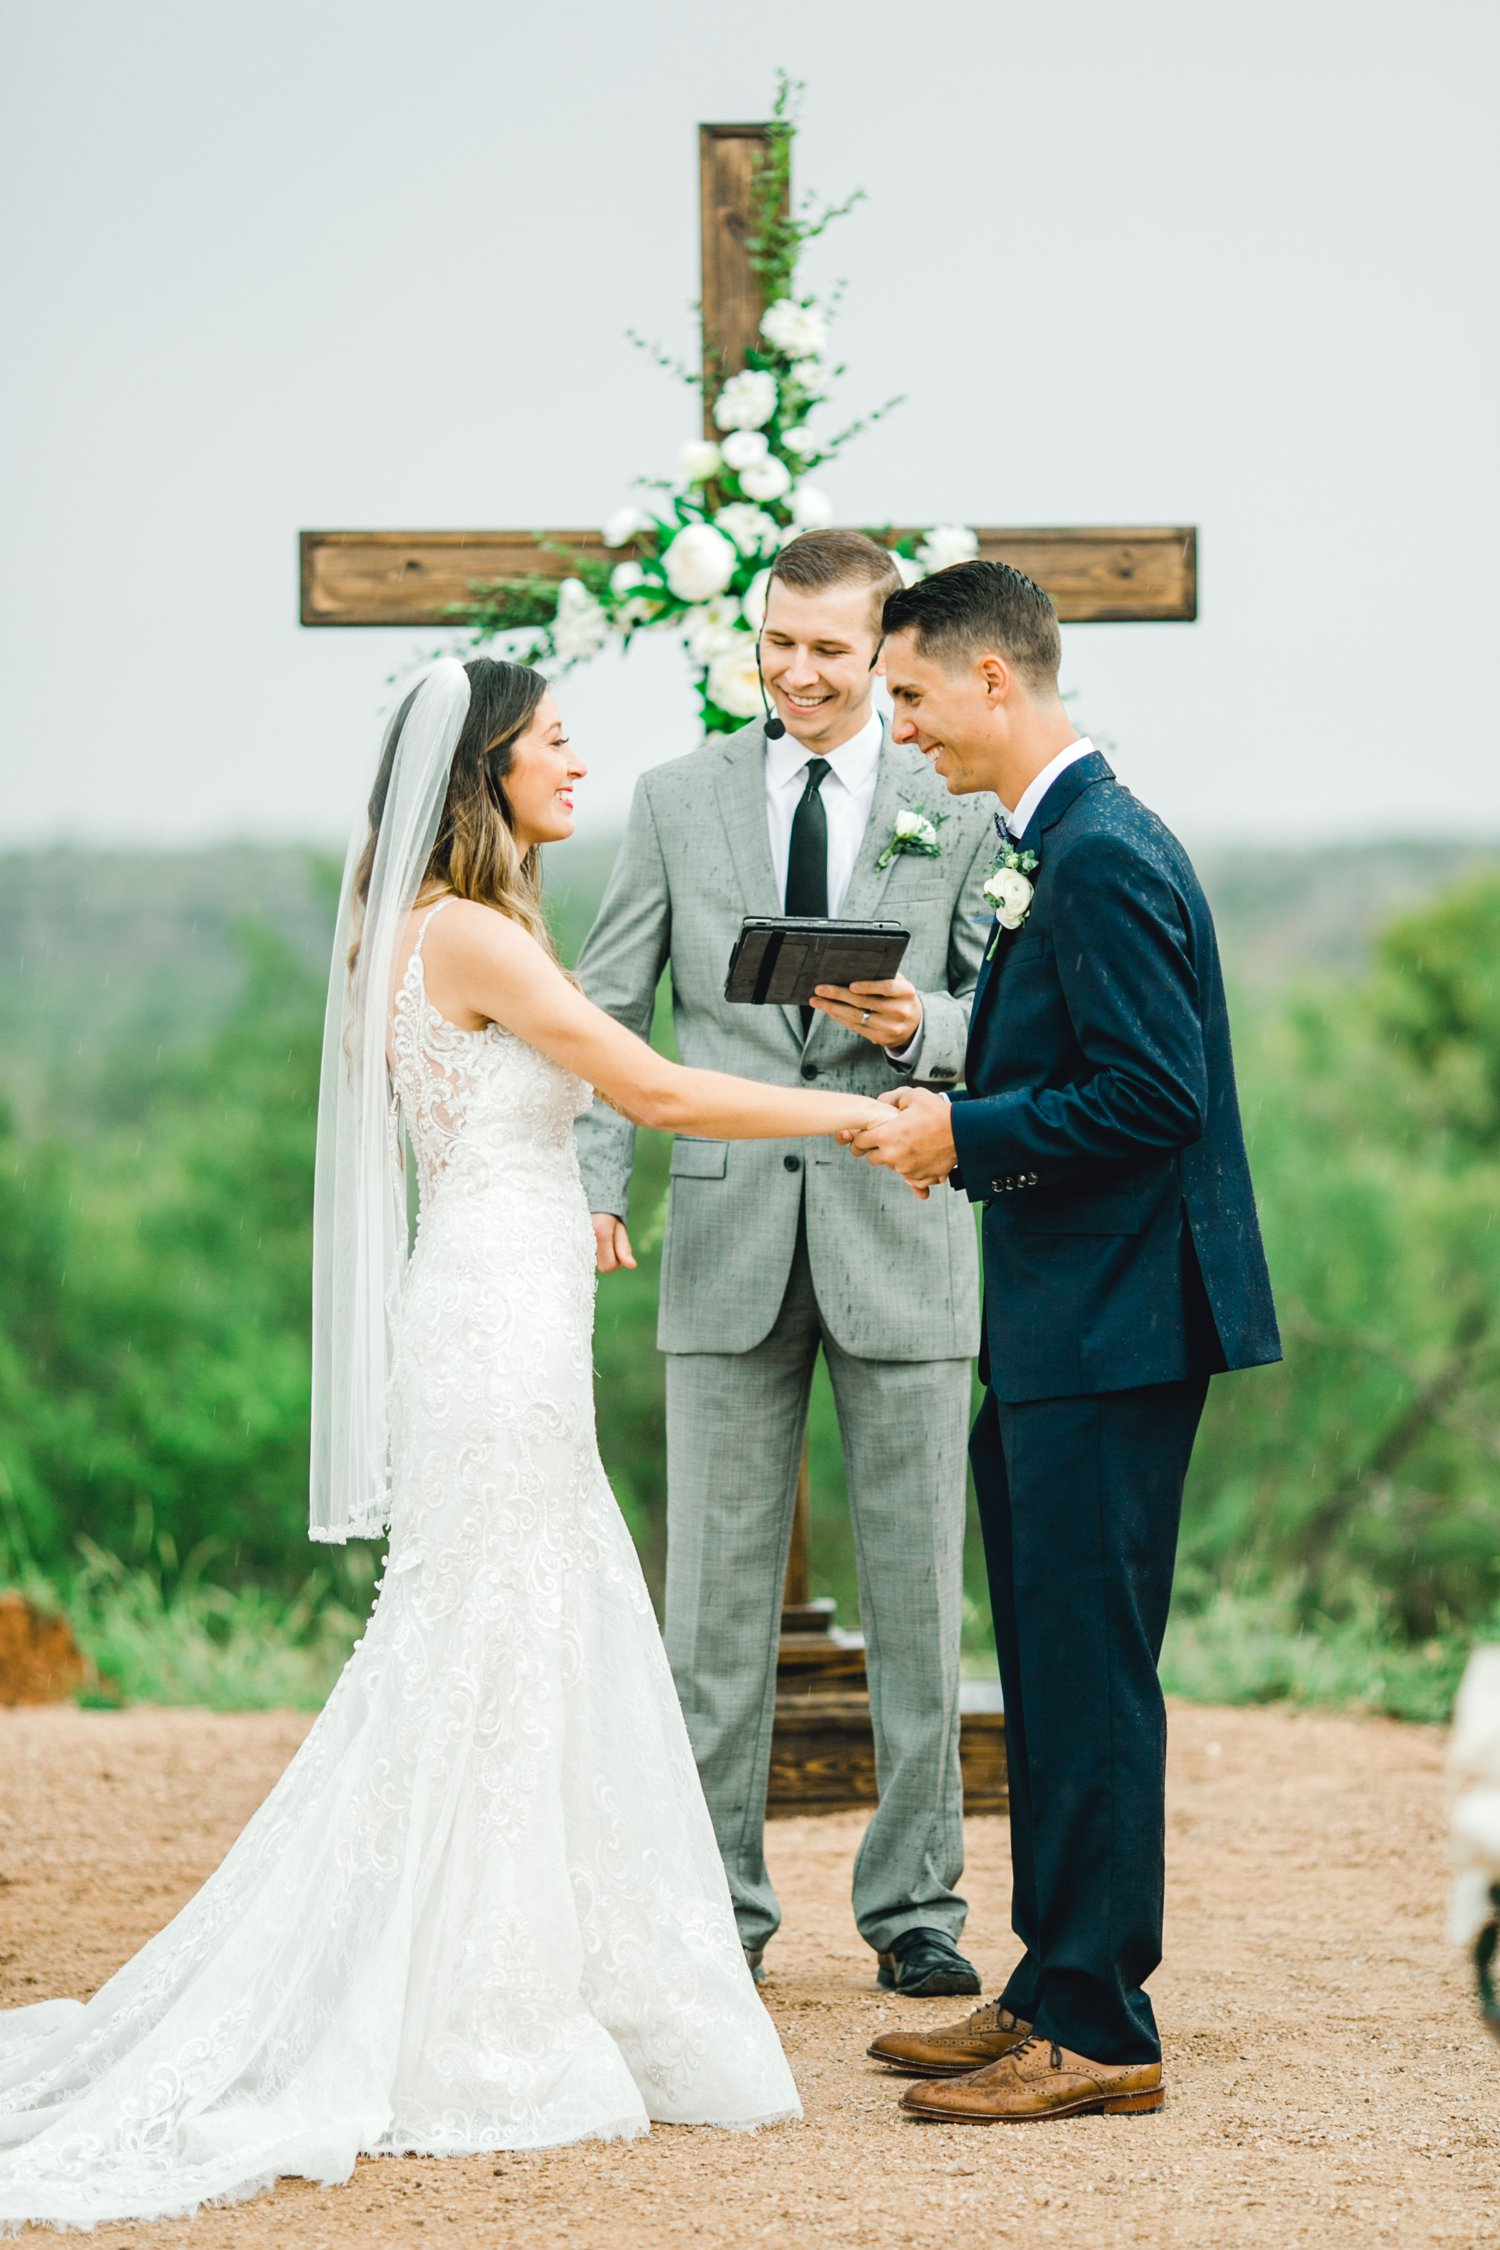 Ashley_John_English_Elegant_Texas_Wedding_Outdoors_Ranch_Caprock_Winery_ALLEEJ_0134.jpg